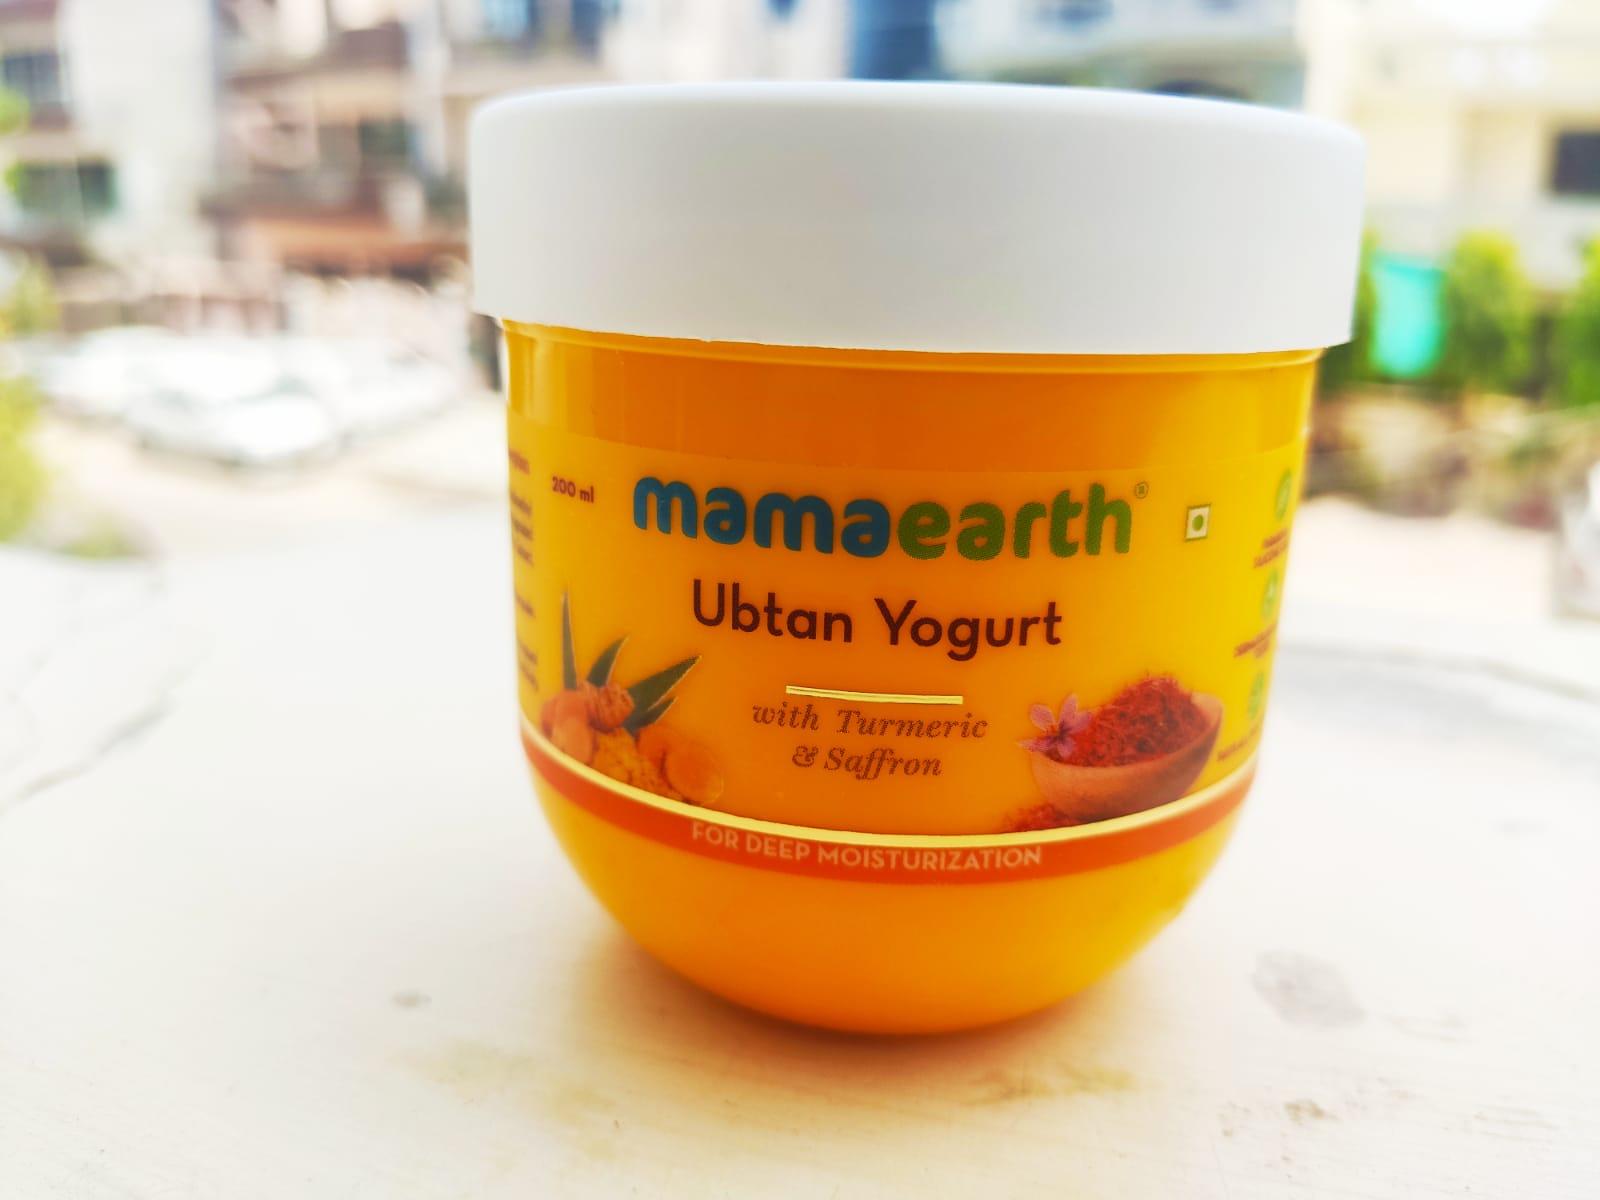 MamaEarth Ubtan Yogurt